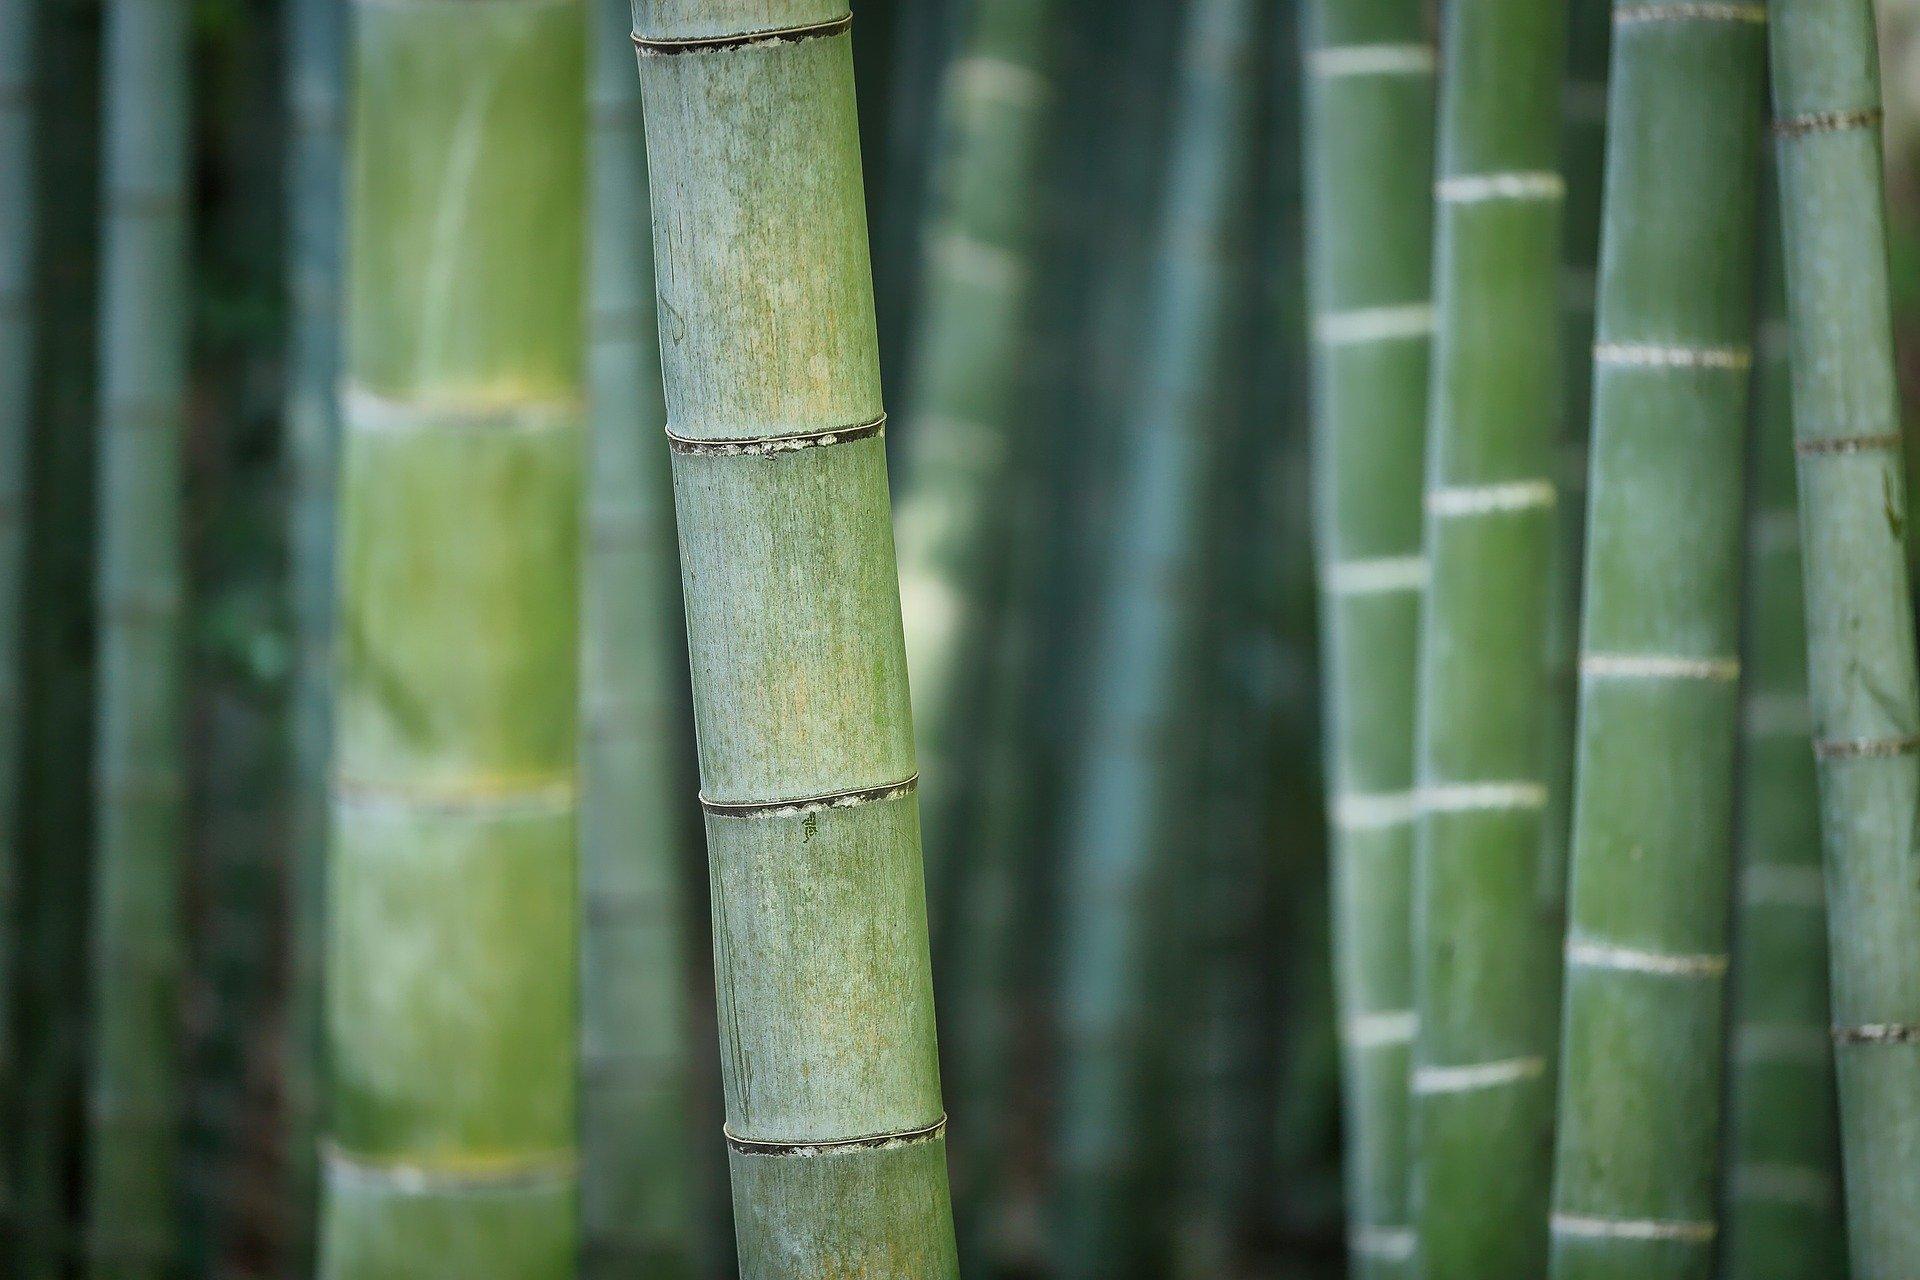 bamboo-3028709_1920